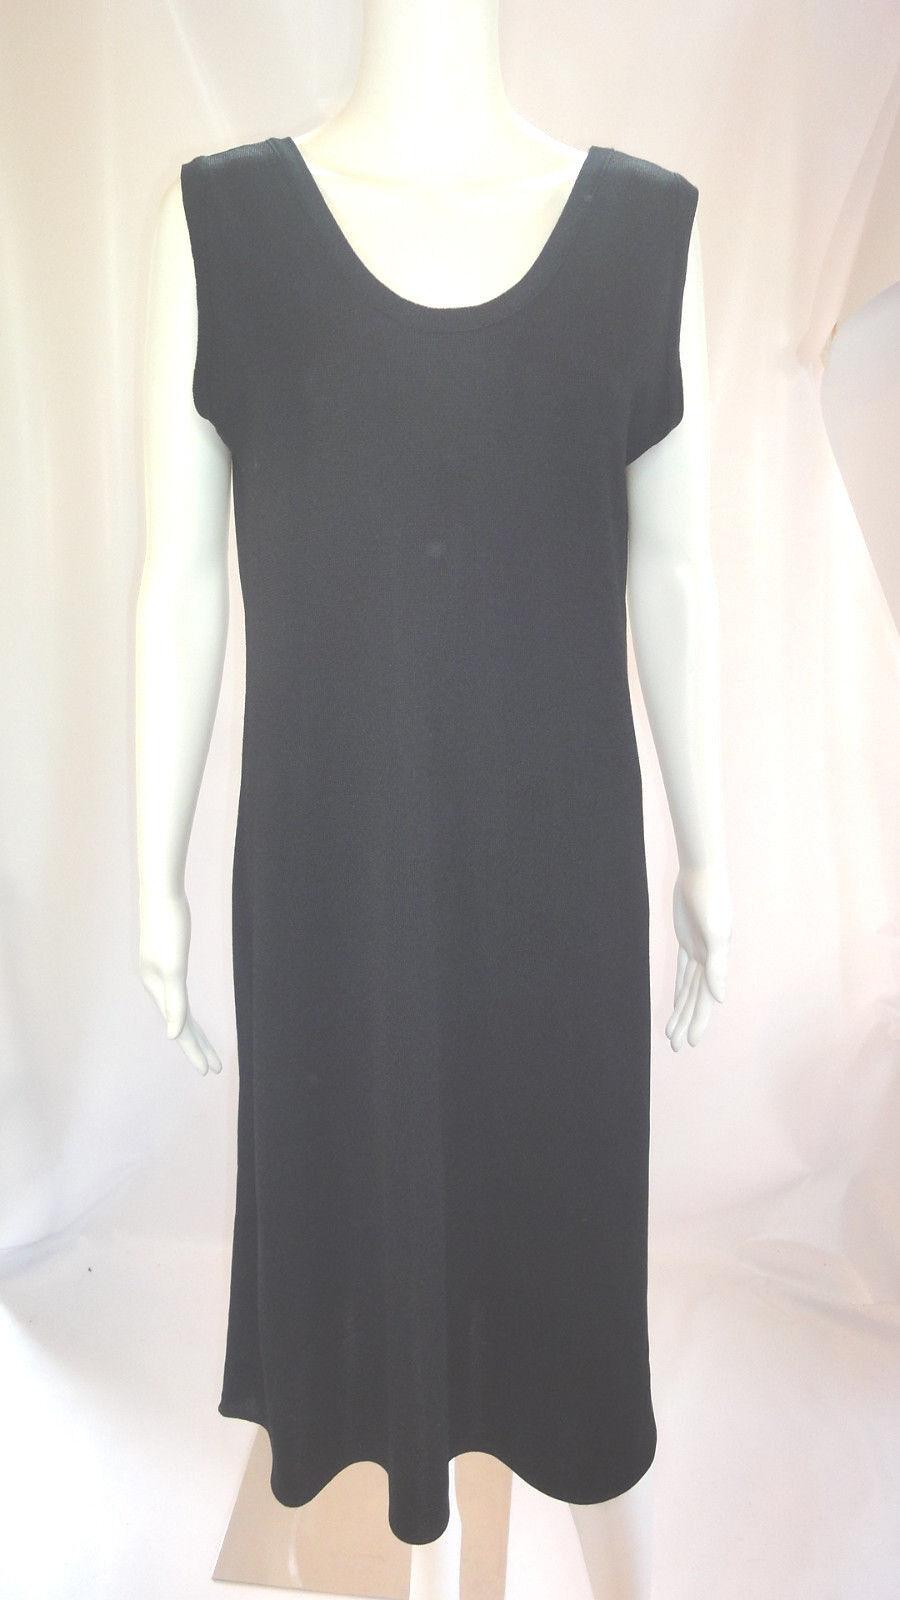 BRENDA FRENCH schwarz  Sleeveless Dress Größe 3